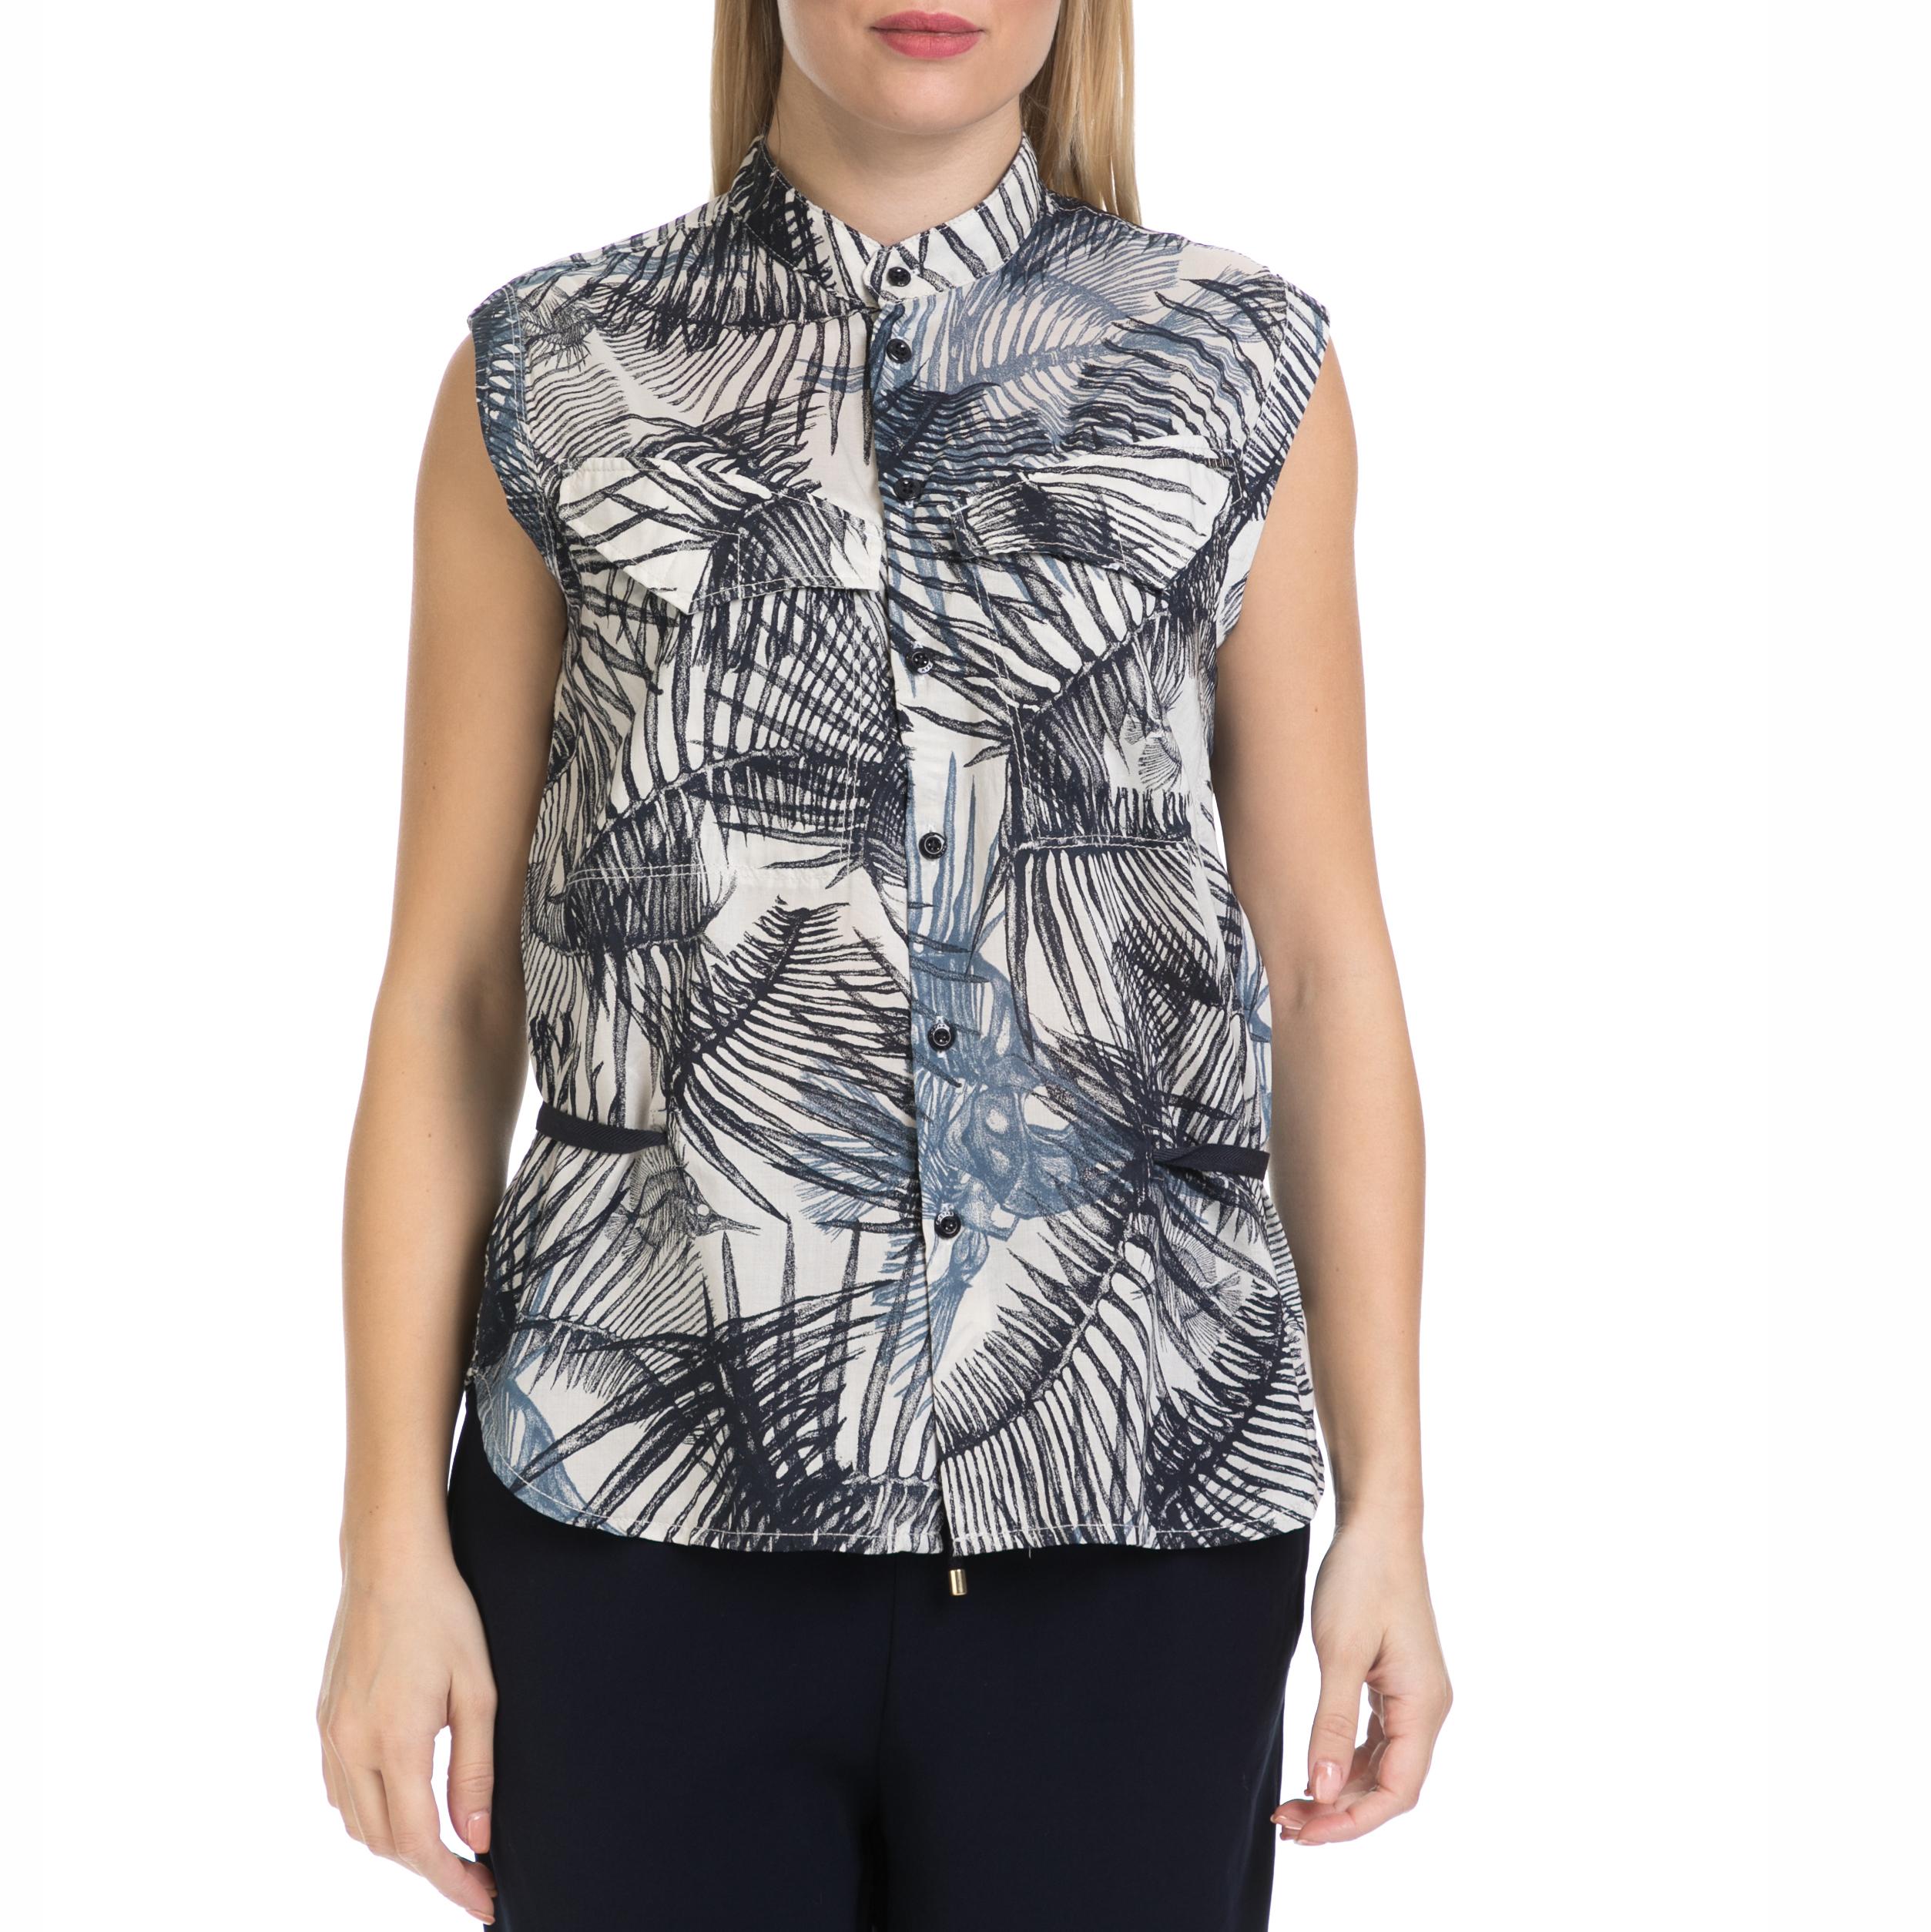 G-STAR - Γυναικείο αμάνικο πουκάμισο Rovic G-STAR εμπριμέ γυναικεία ρούχα πουκάμισα κοντομάνικα αμάνικα